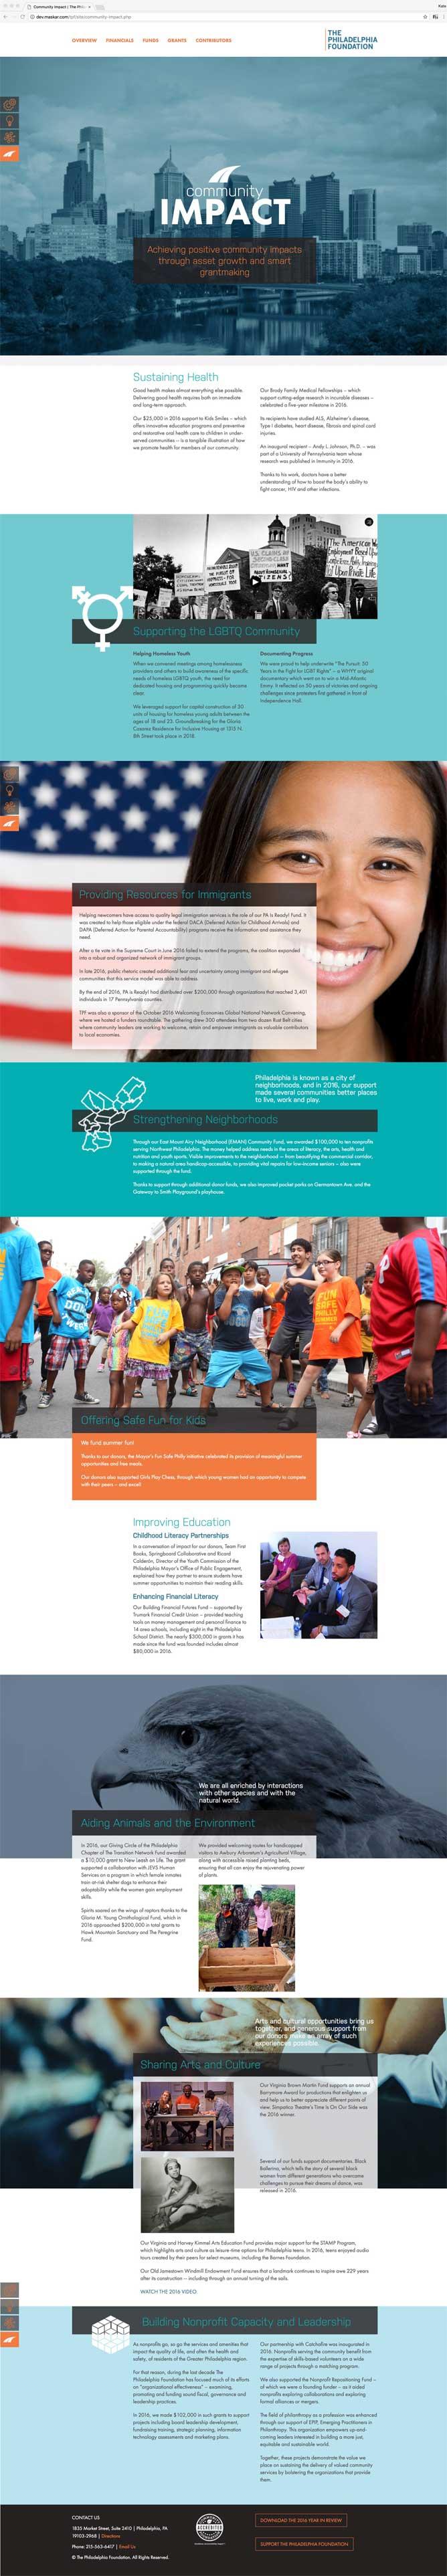 Website design for the Philadelphia Foundation 2016 annual report